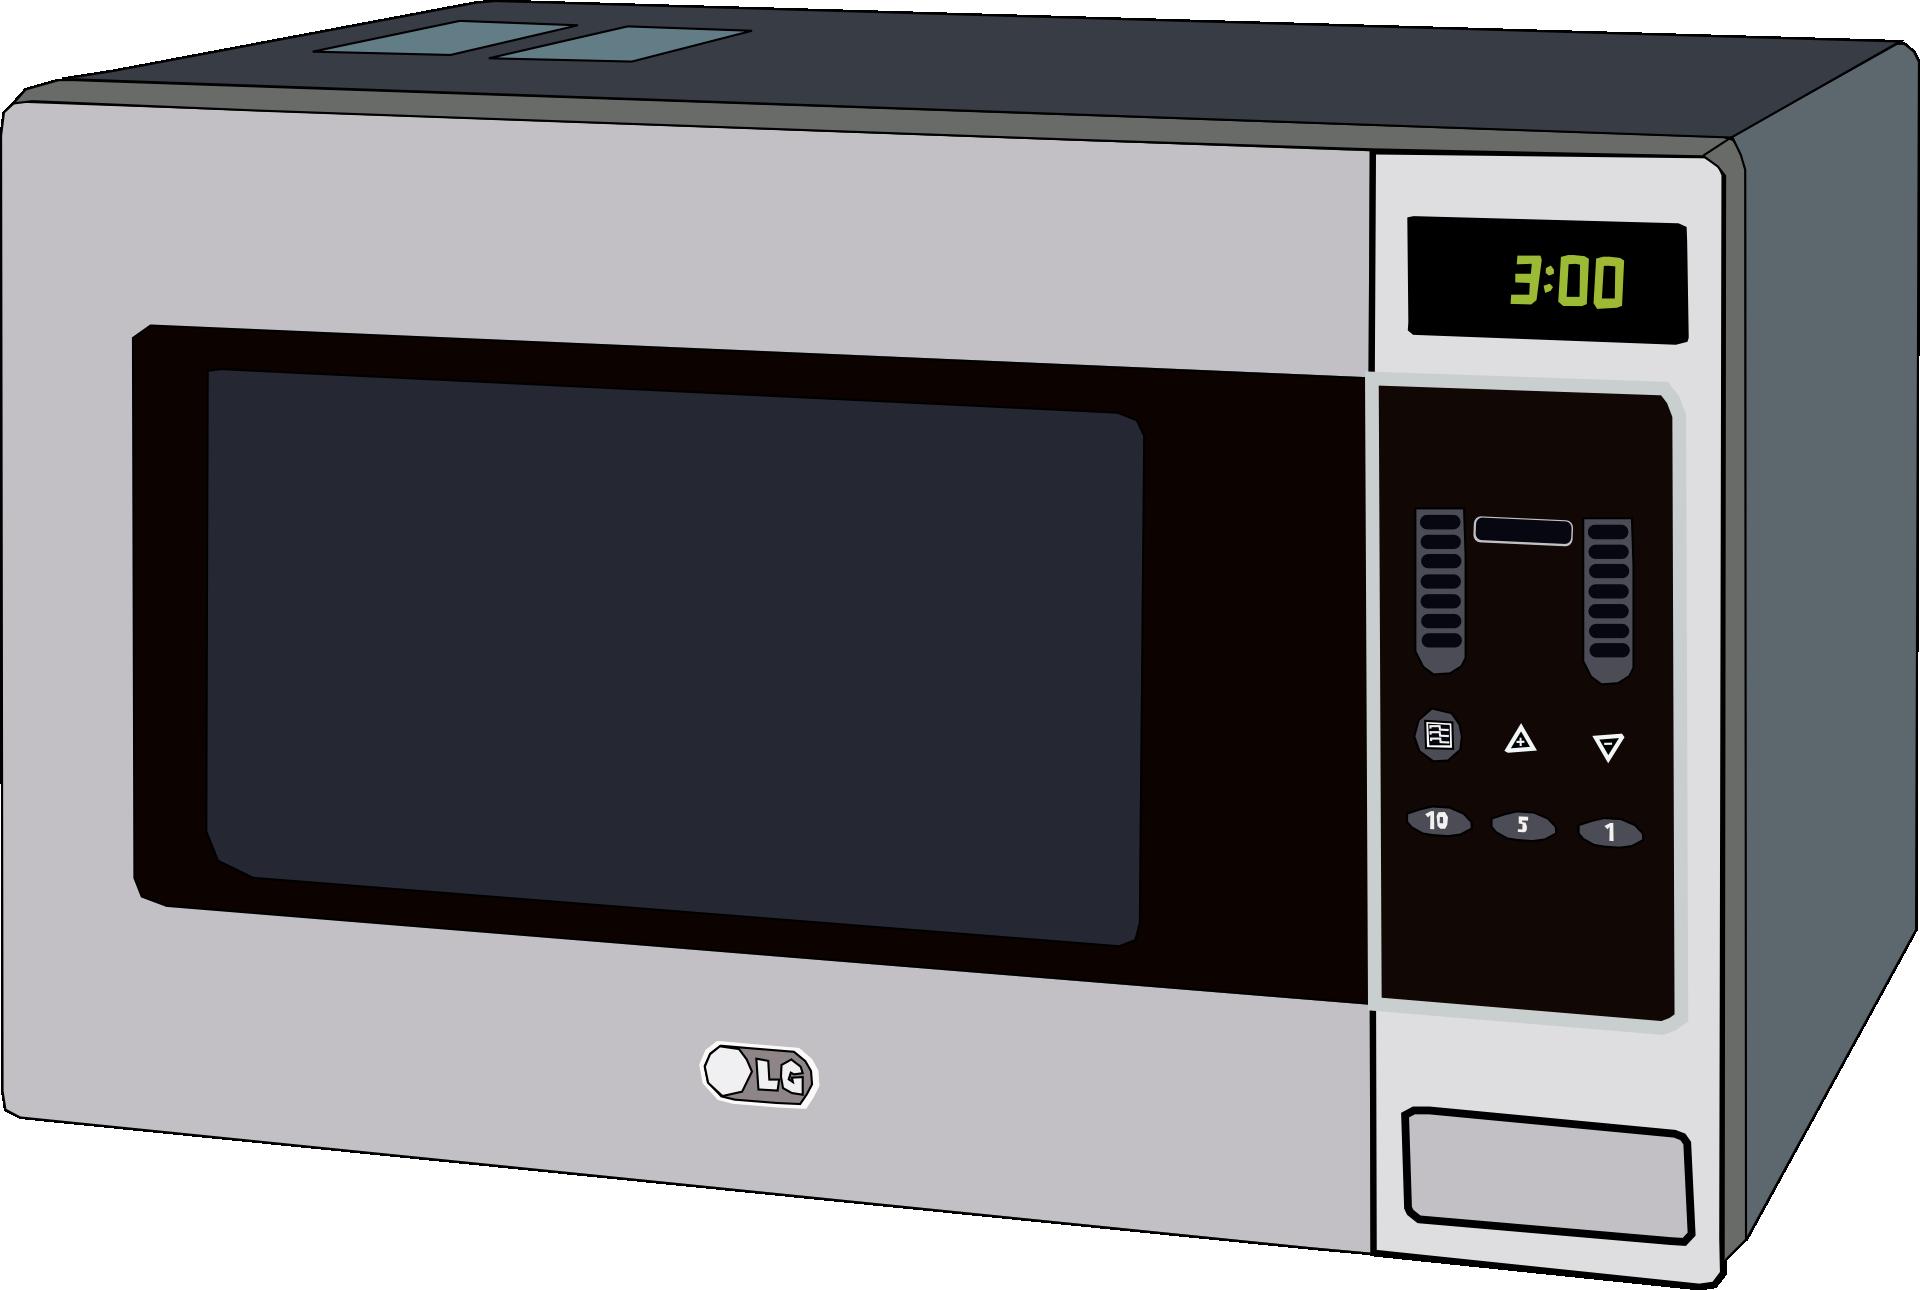 Cara mengeringkan hp dengan oven